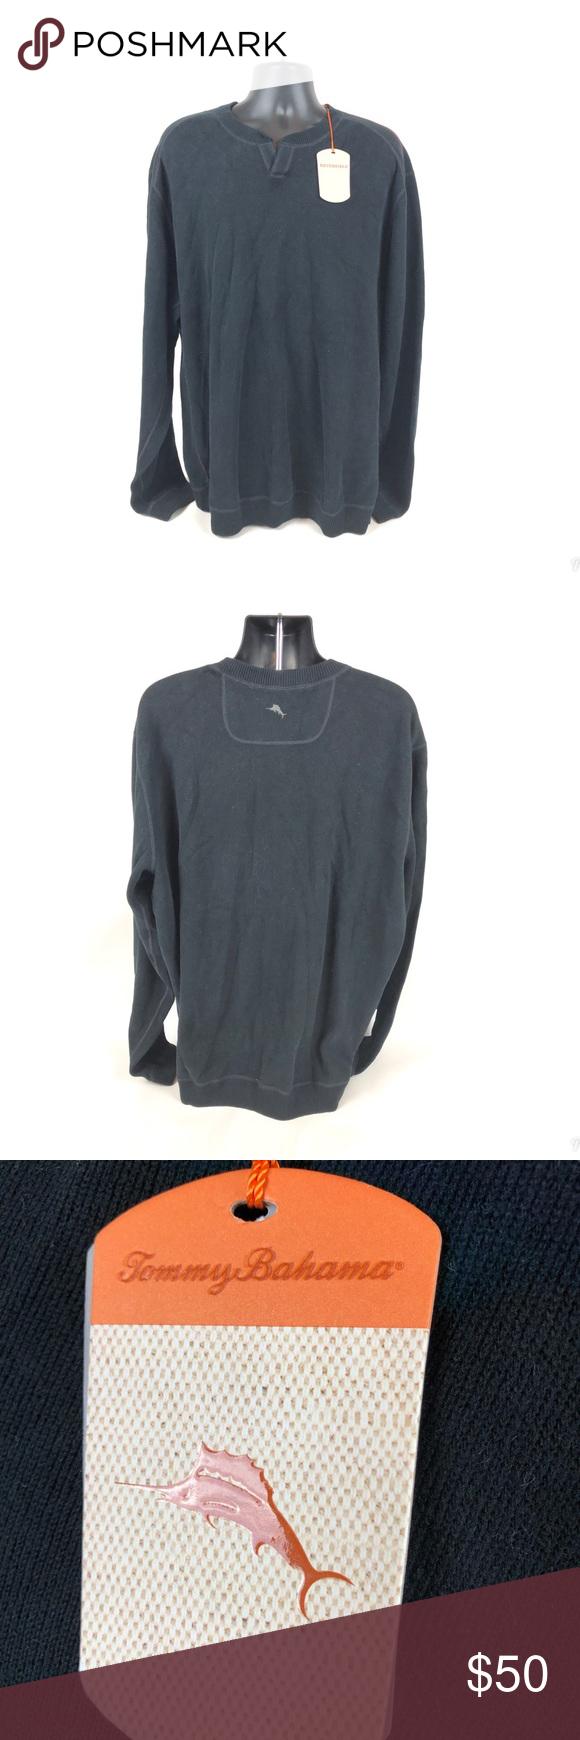 Brand New Men S Tommy Bahama Reversible Sweatshirt Pullover Sweatshirt Men Tommy Hilfiger Sweater Sweatshirts [ 1740 x 580 Pixel ]